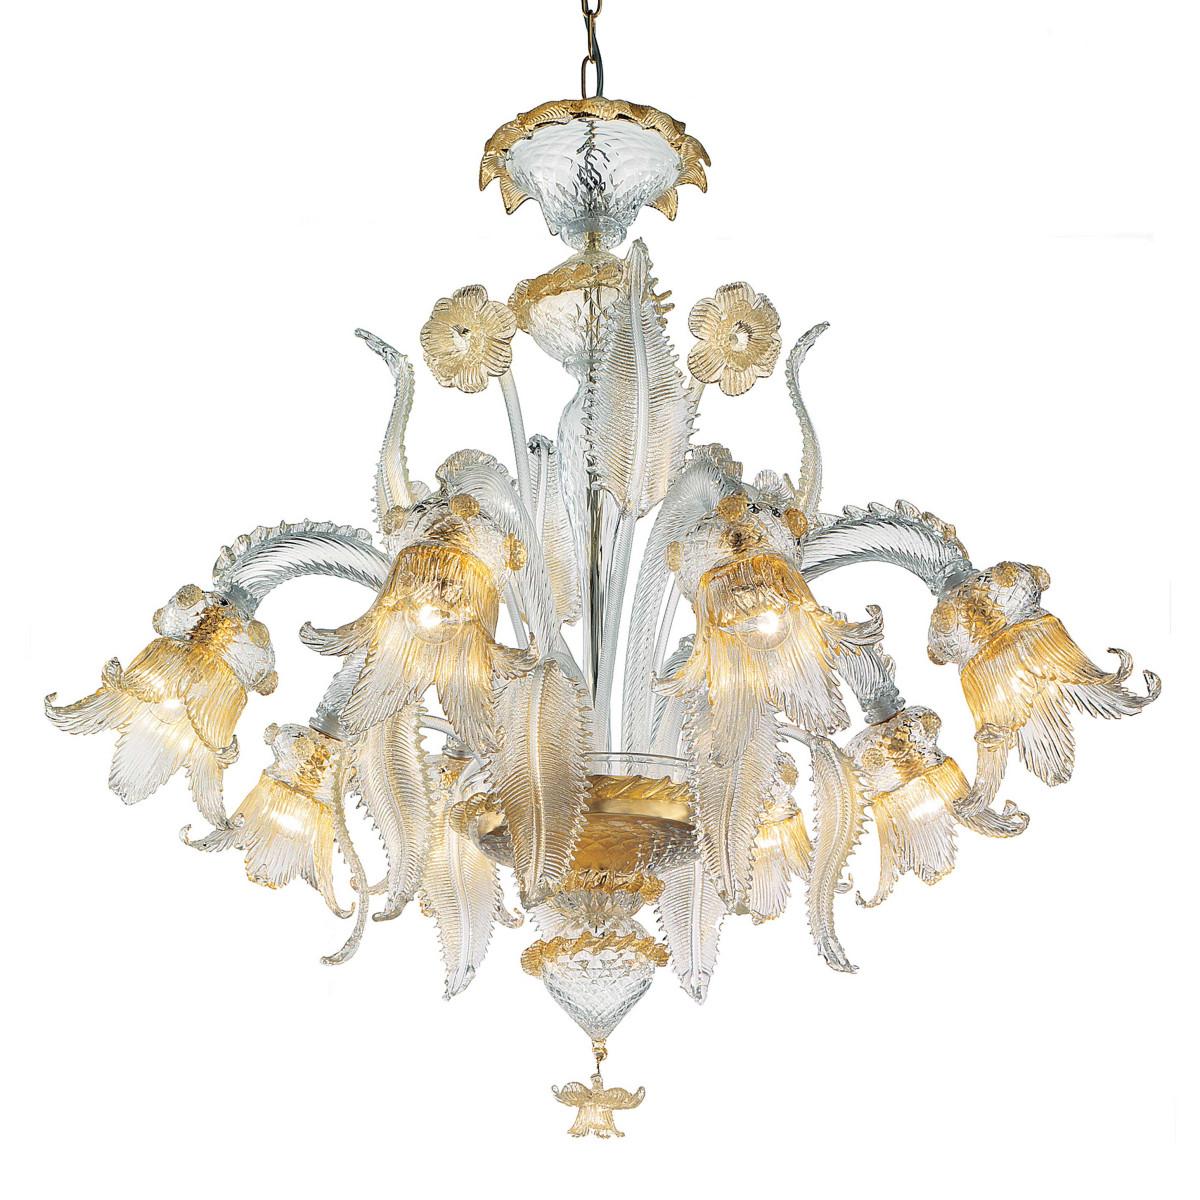 Fenice 6 flammig Murano Kronleuchter - transparente Gold Farbe